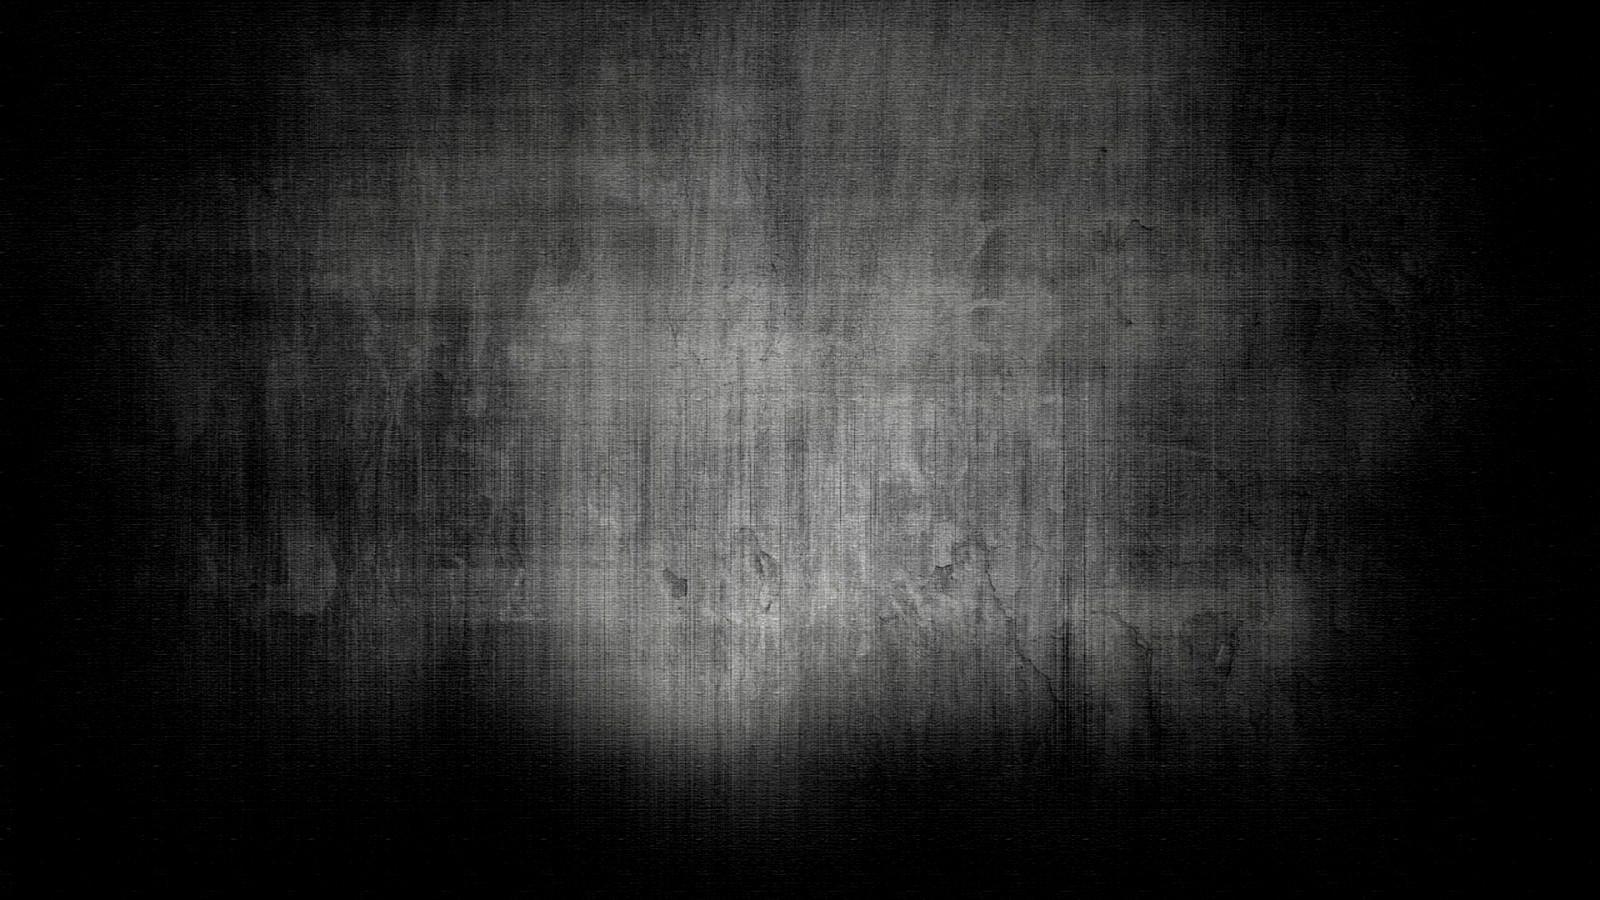 Cool Wallpapers For Phones 3d Dark Background Wallpaper 1600x900 3036